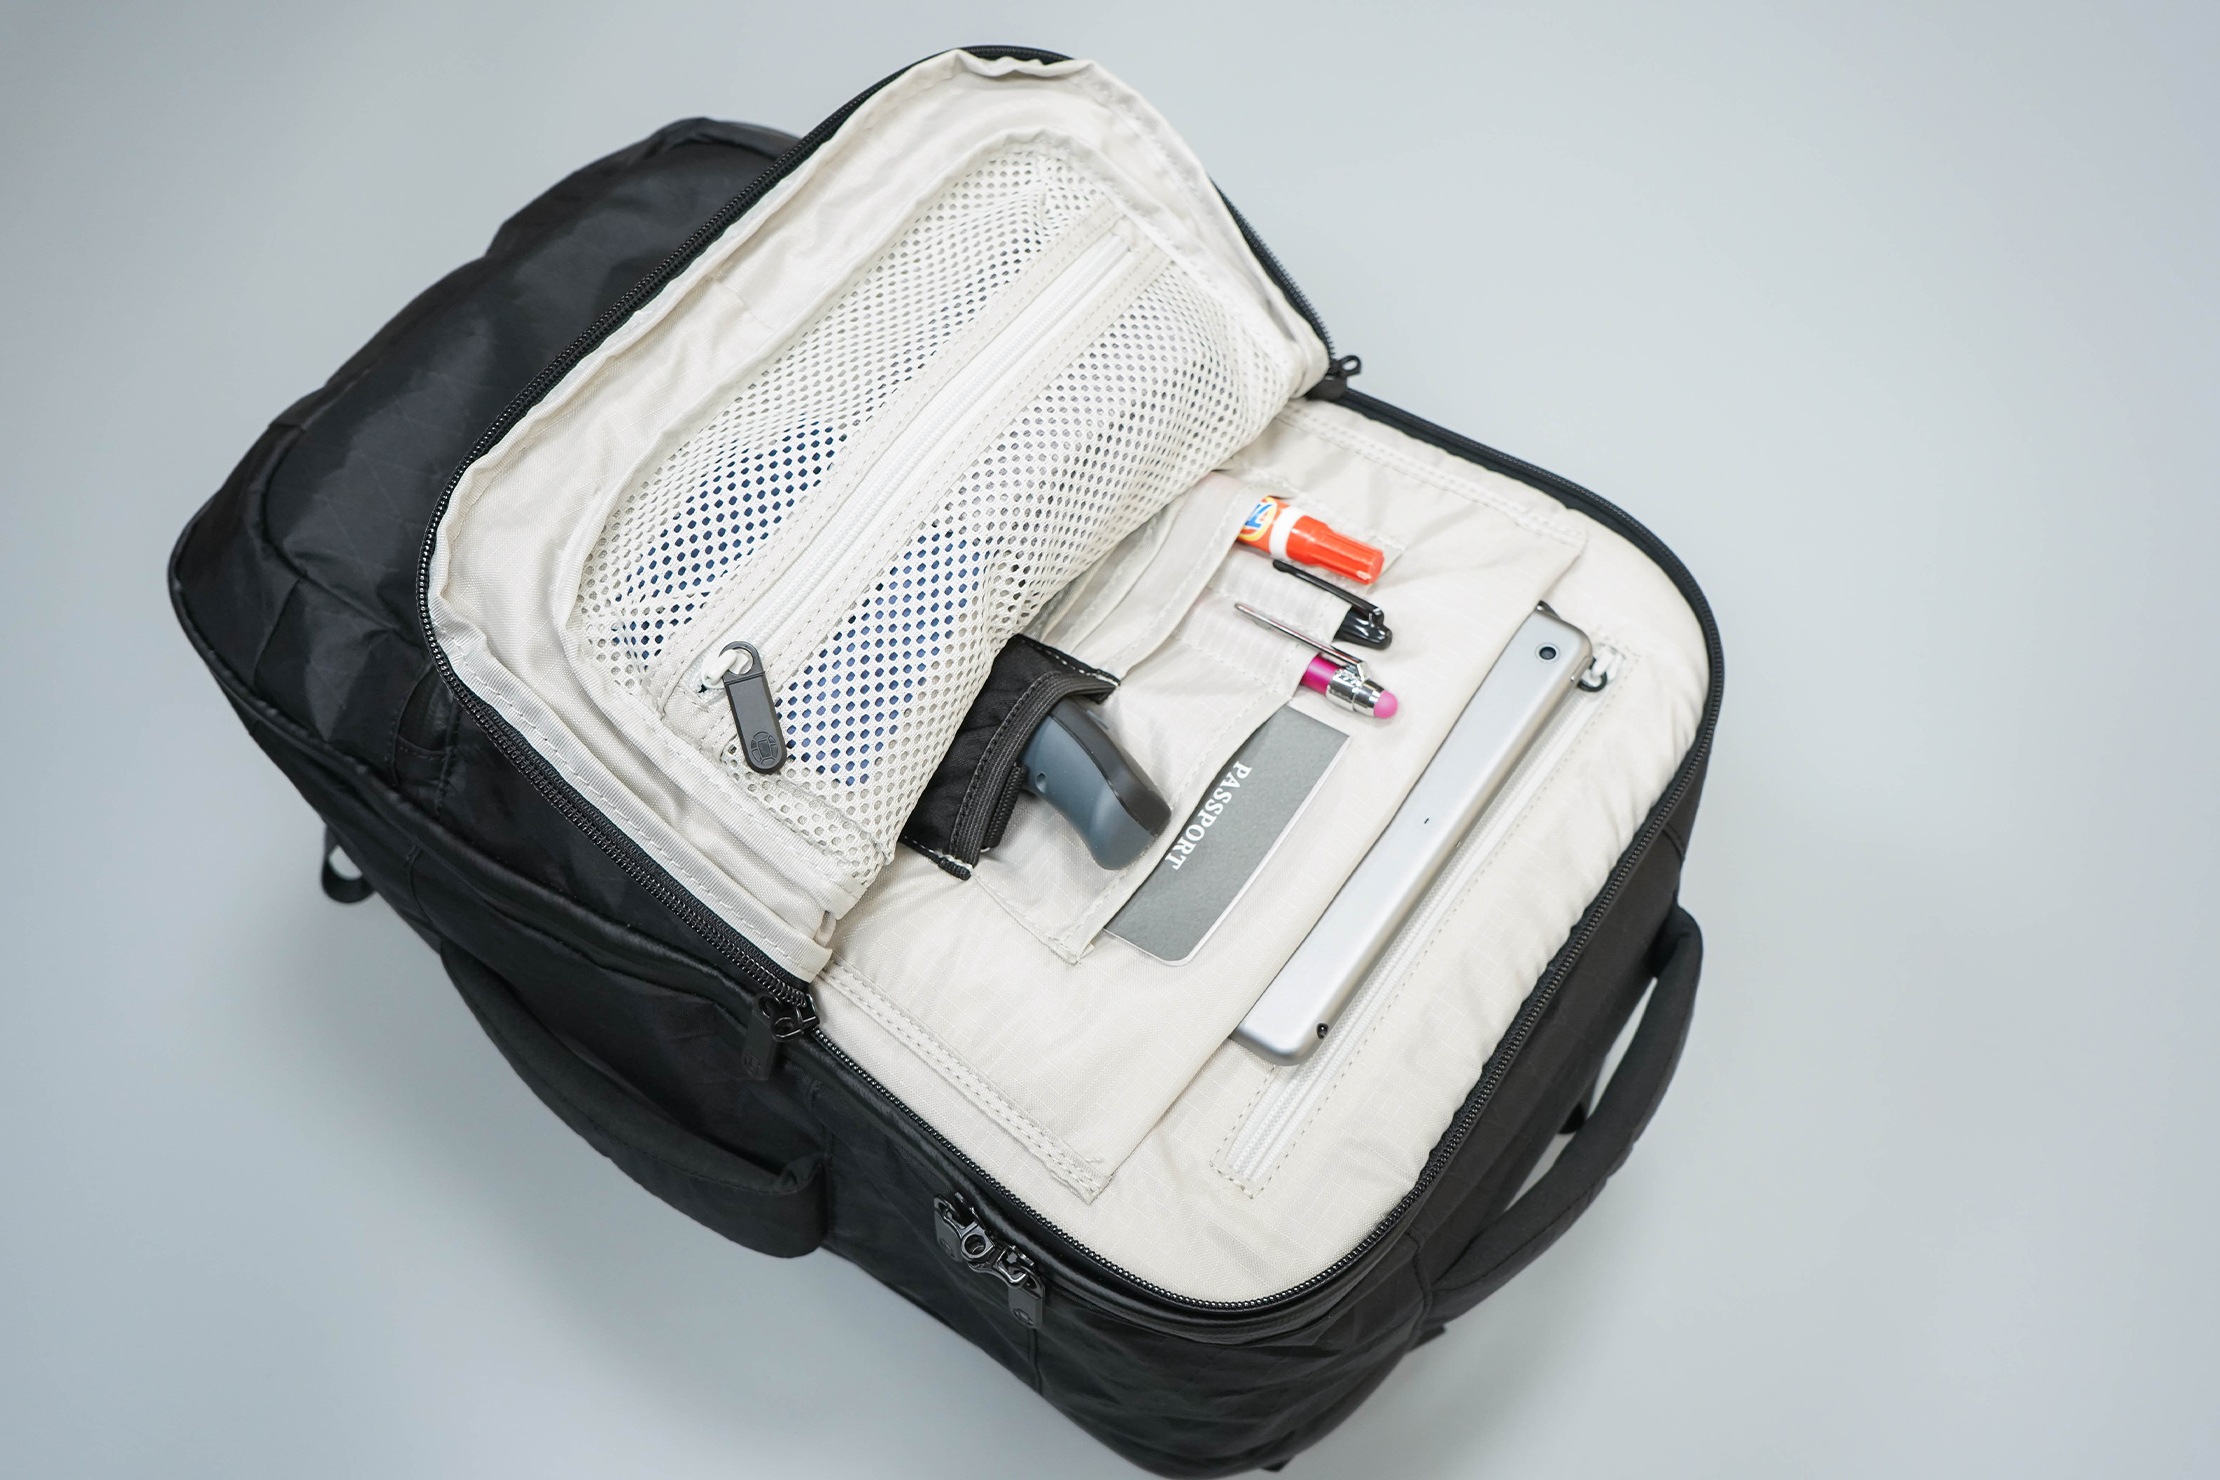 Tortuga Outbreaker Laptop Backpack Front Inside Organization